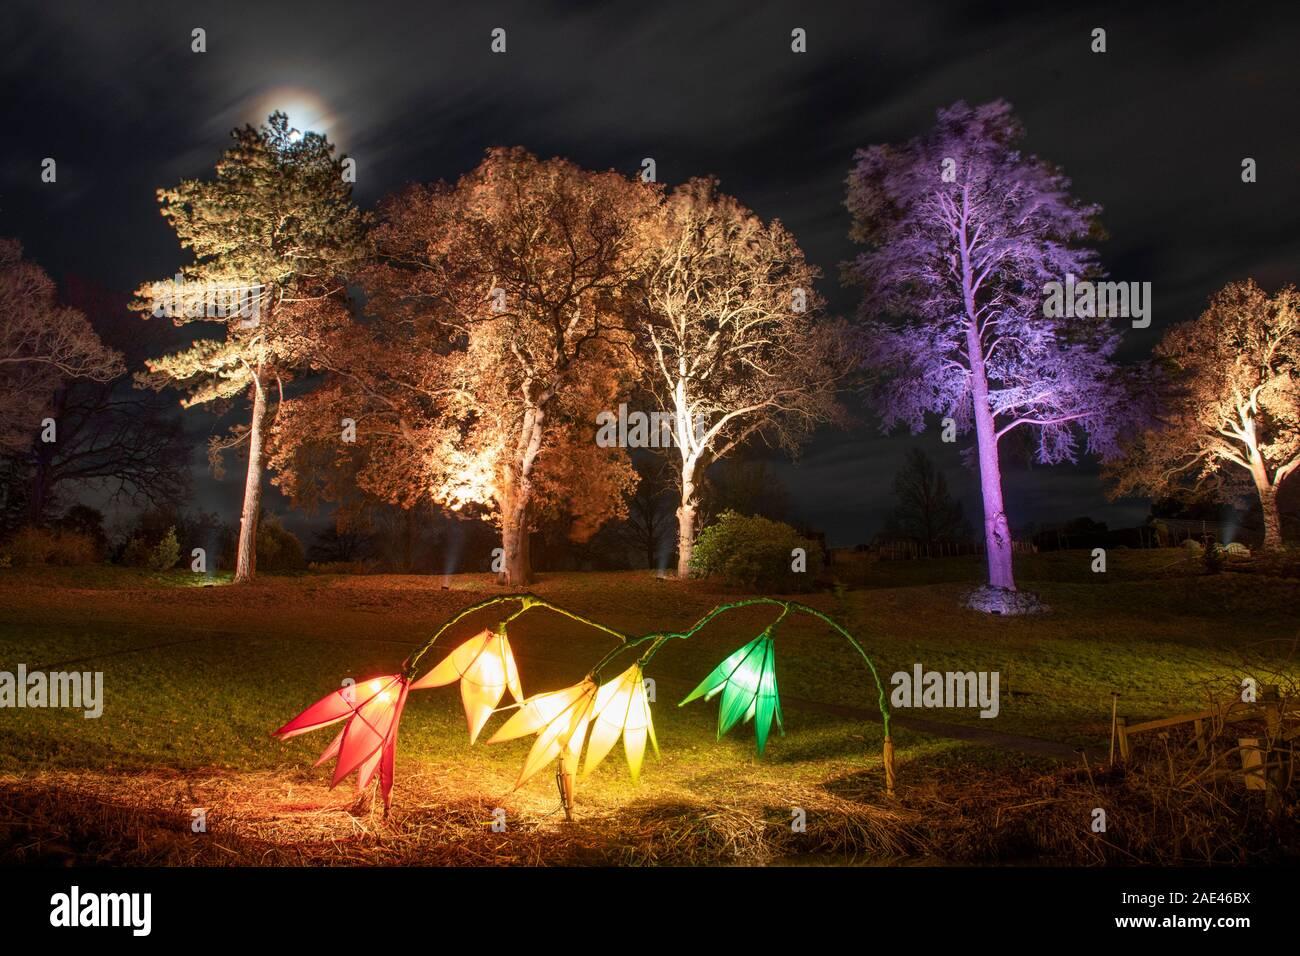 Rhs Wisley Surrey Uk Rhs Gardens Winter Glow 2019 6th December 2019 Preview Of Enchanting Trail